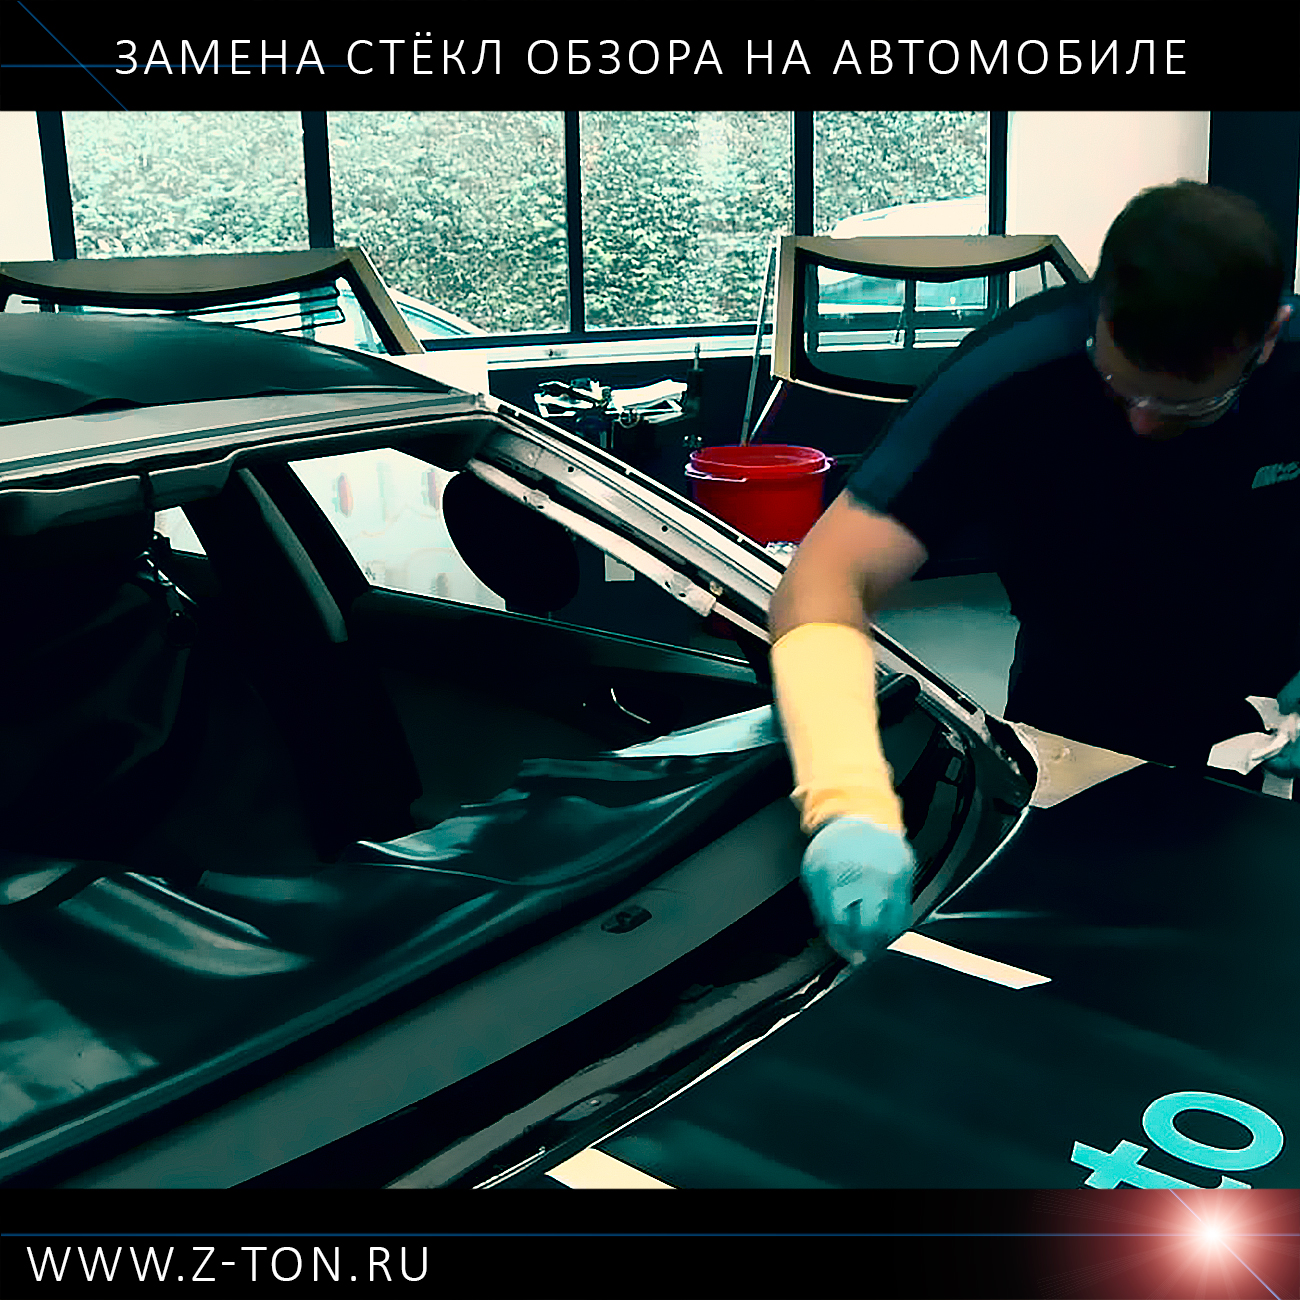 Замена лобового стекла в Зеленограде (Андреевка, Крюково, Москва)